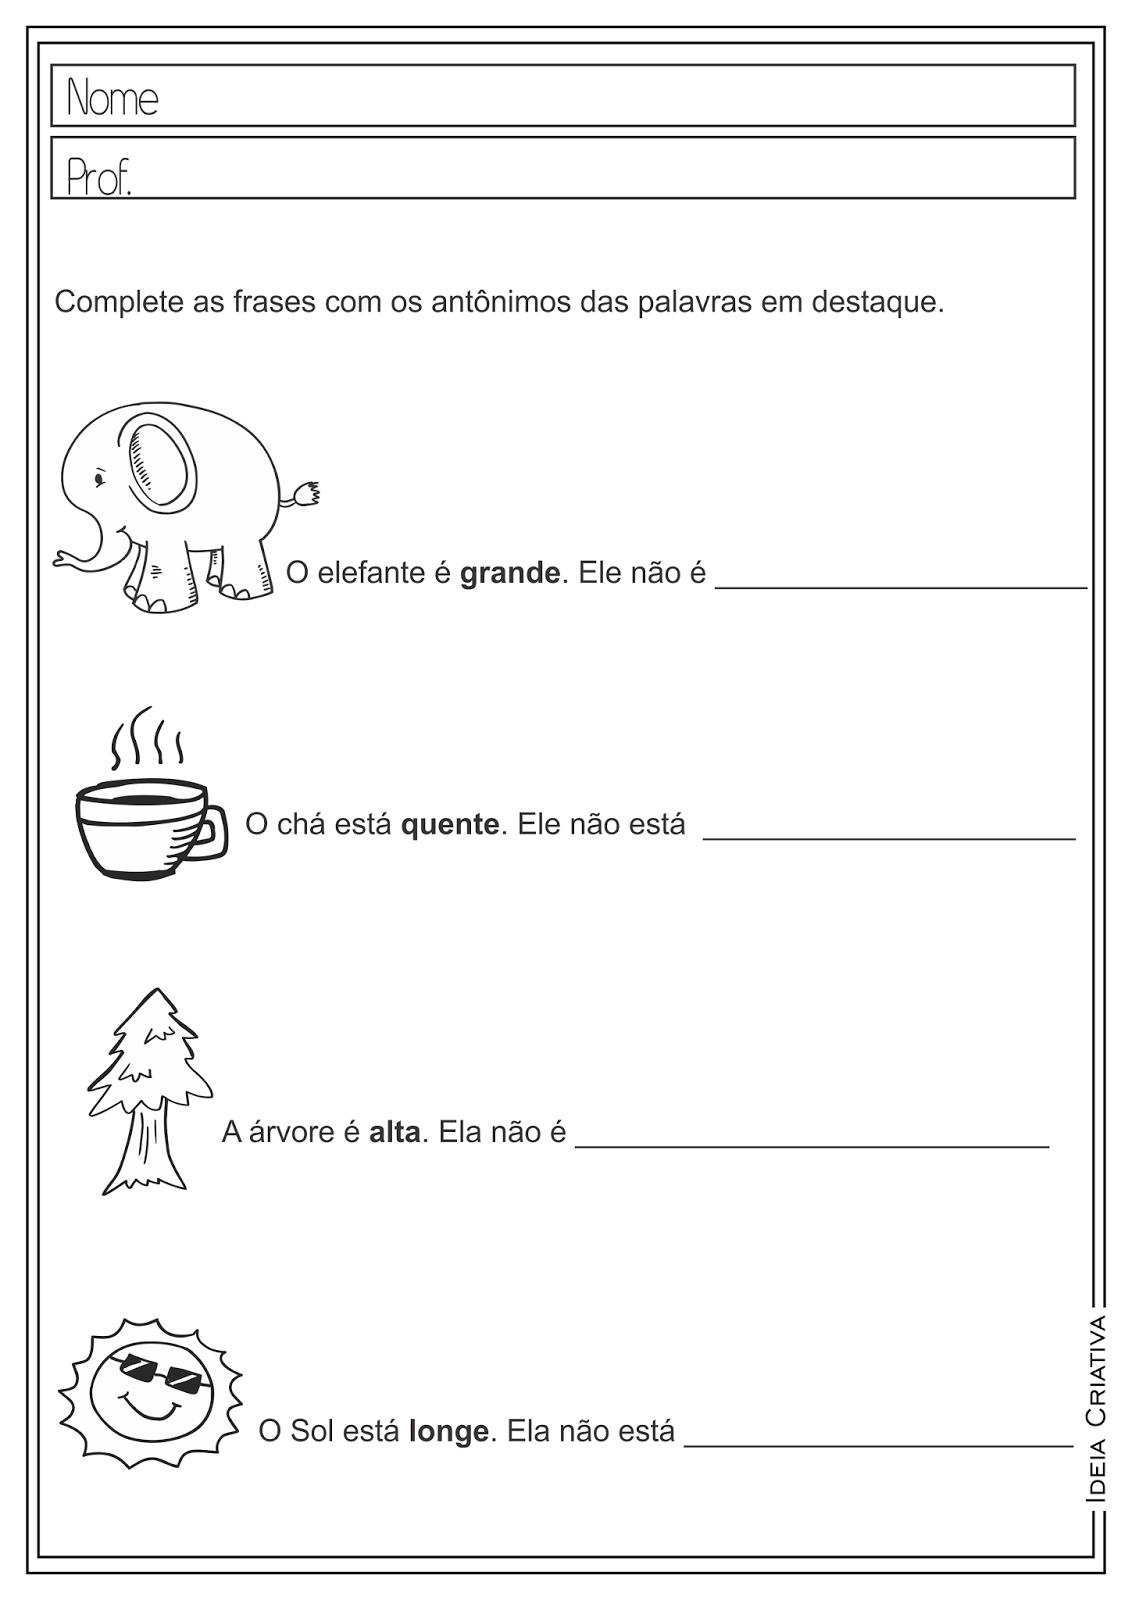 Atividades Educativas Antônimos Língua Portuguesa para Ensino Fundamental